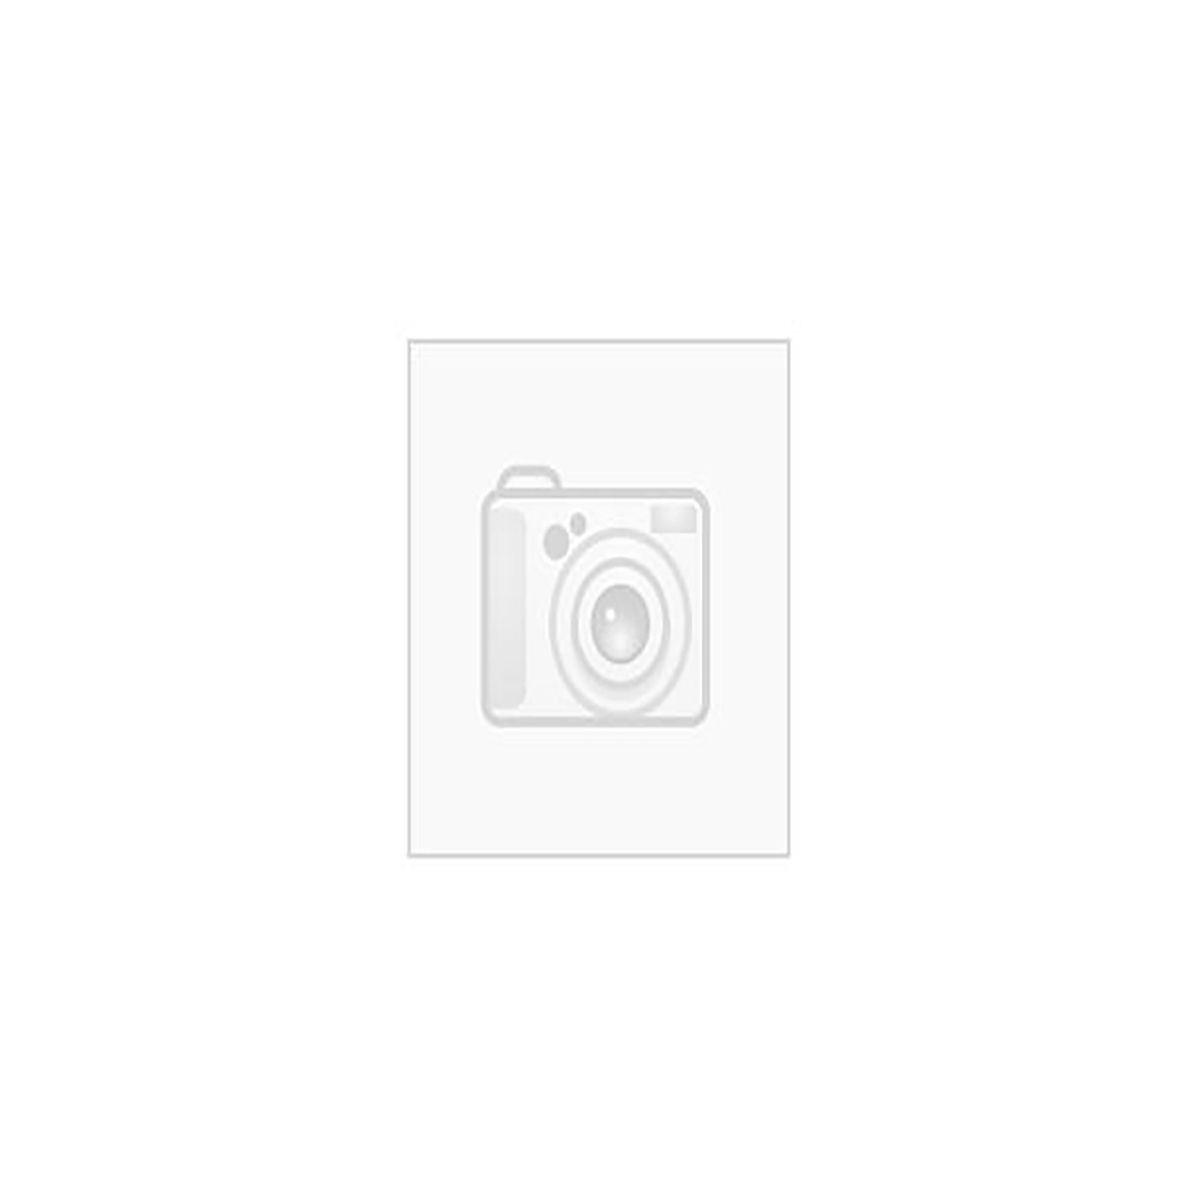 Toalett | Dobbel spyling | IDO Seven D | Jula